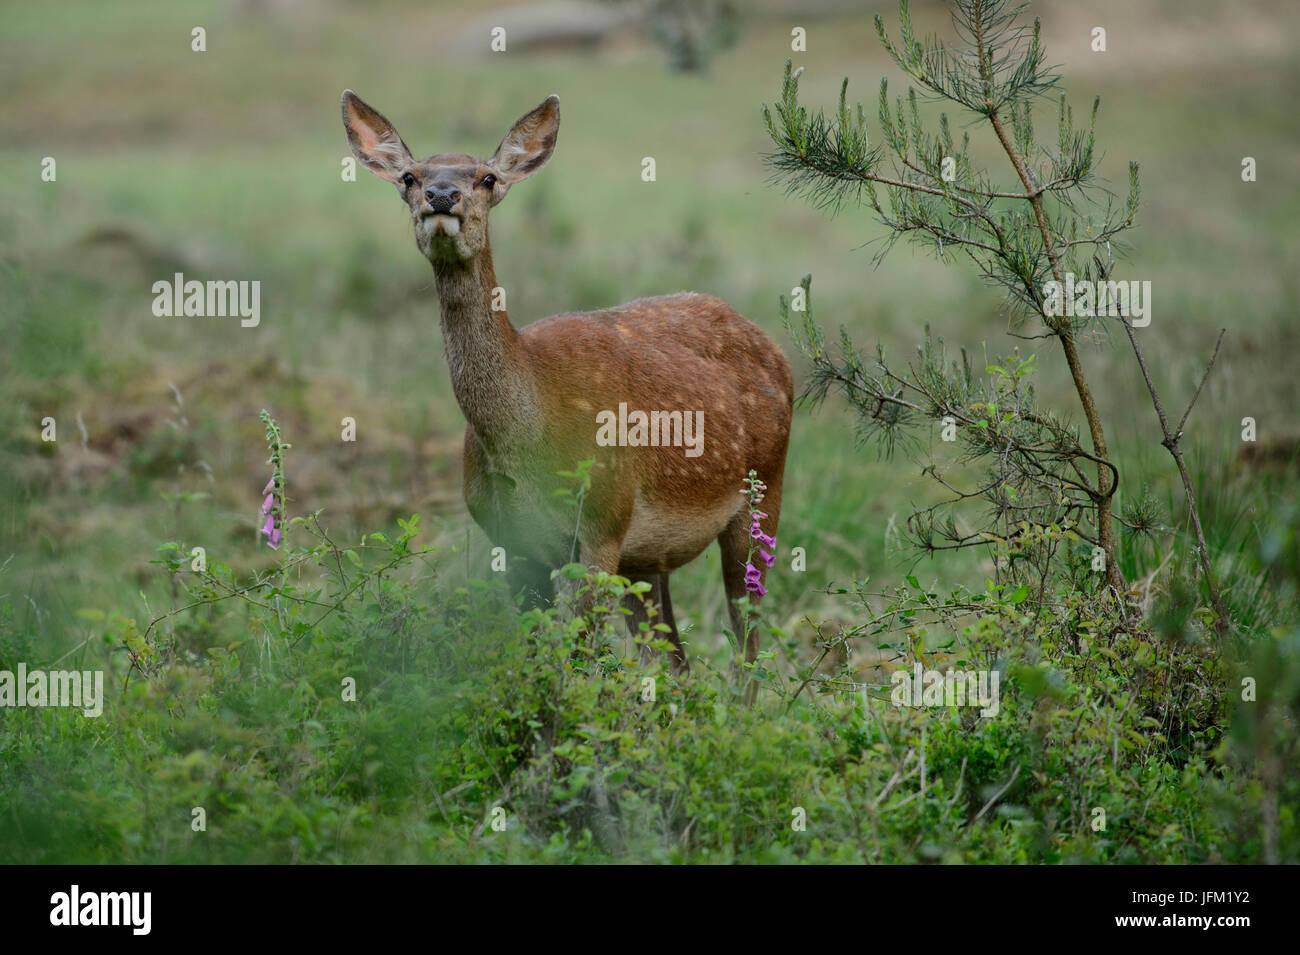 Red Deer hind maleodoranti nell'aria, con foxglove fiori. Hoge Veluwe National Park, Paesi Bassi Immagini Stock